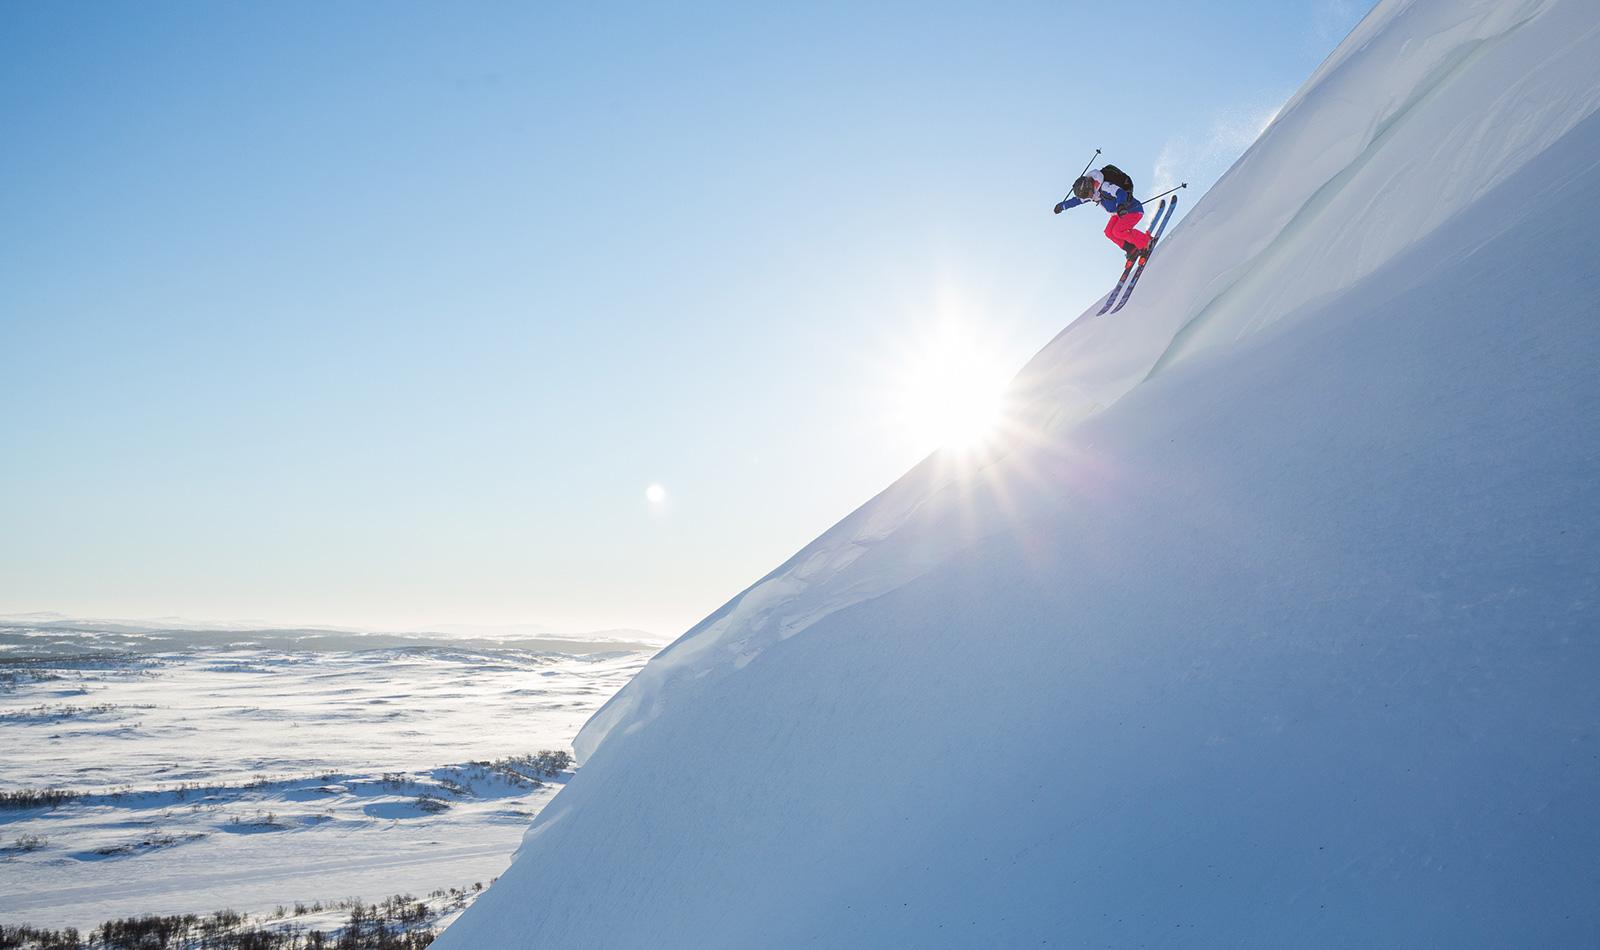 Off Piste Skiing in Jämtland Härjedalen   Photo by Mark Going